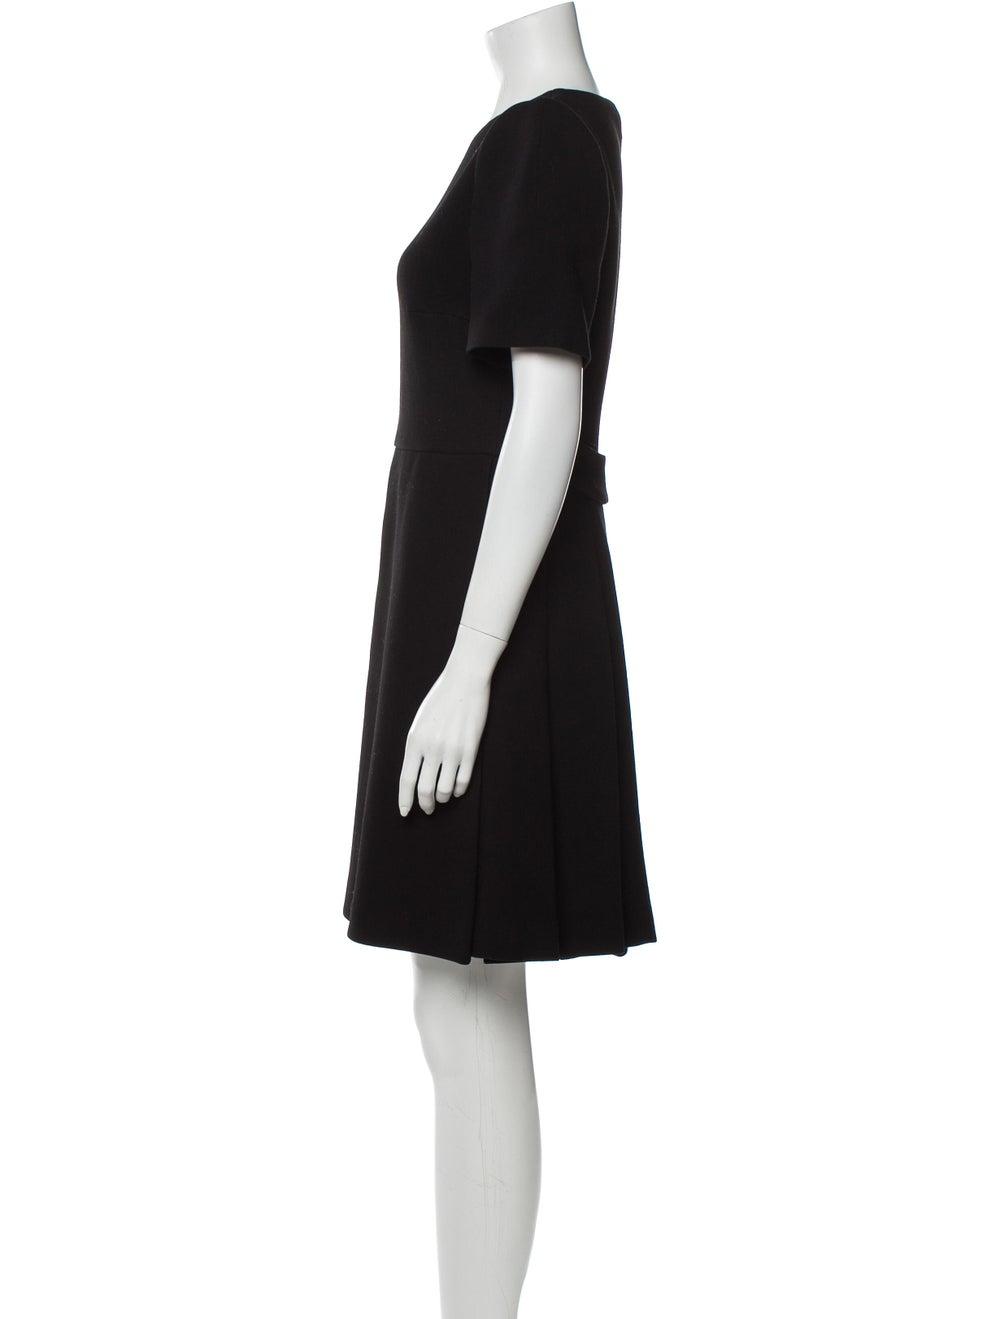 Prada Virgin Wool Mini Dress Wool - image 2